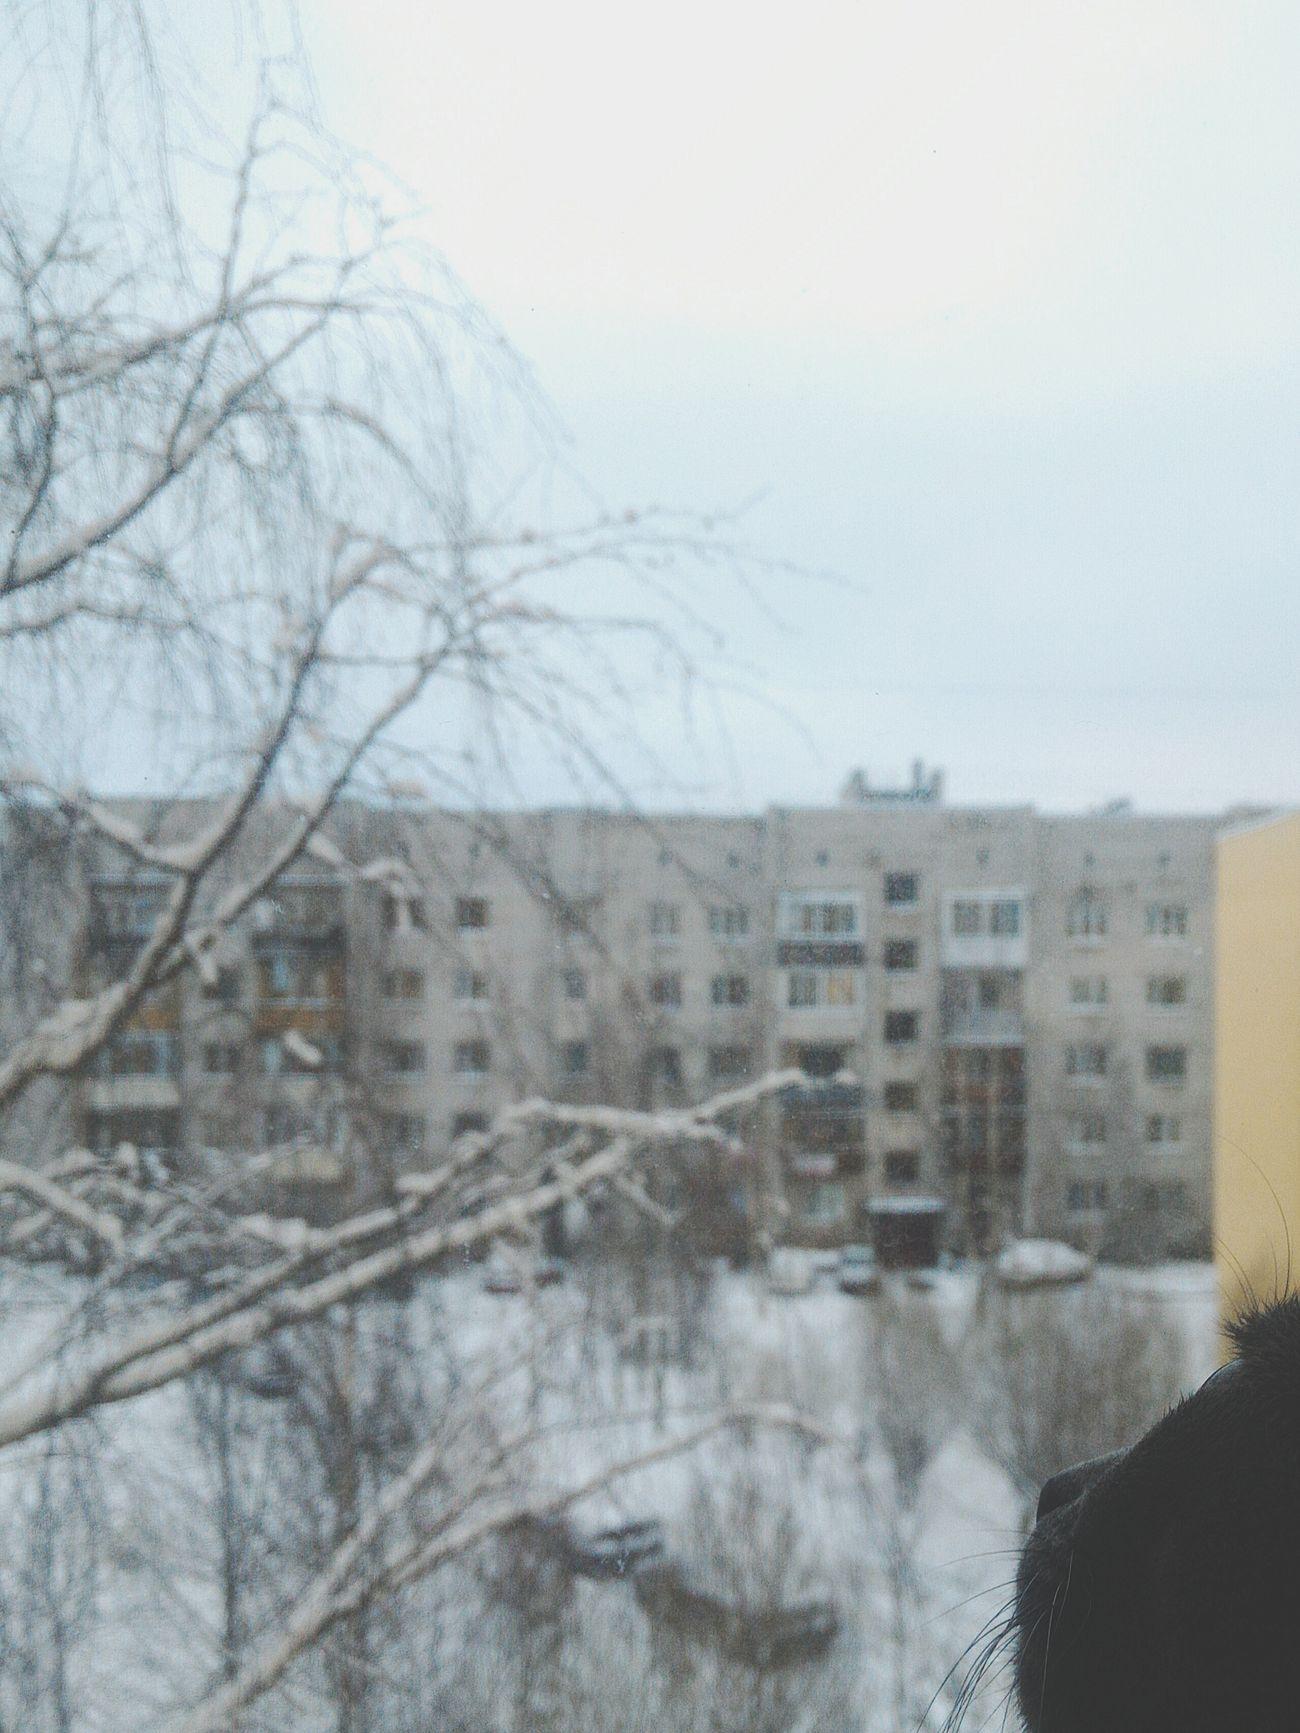 Winter Snow ❄ Snow Russianwinter Cold ❄